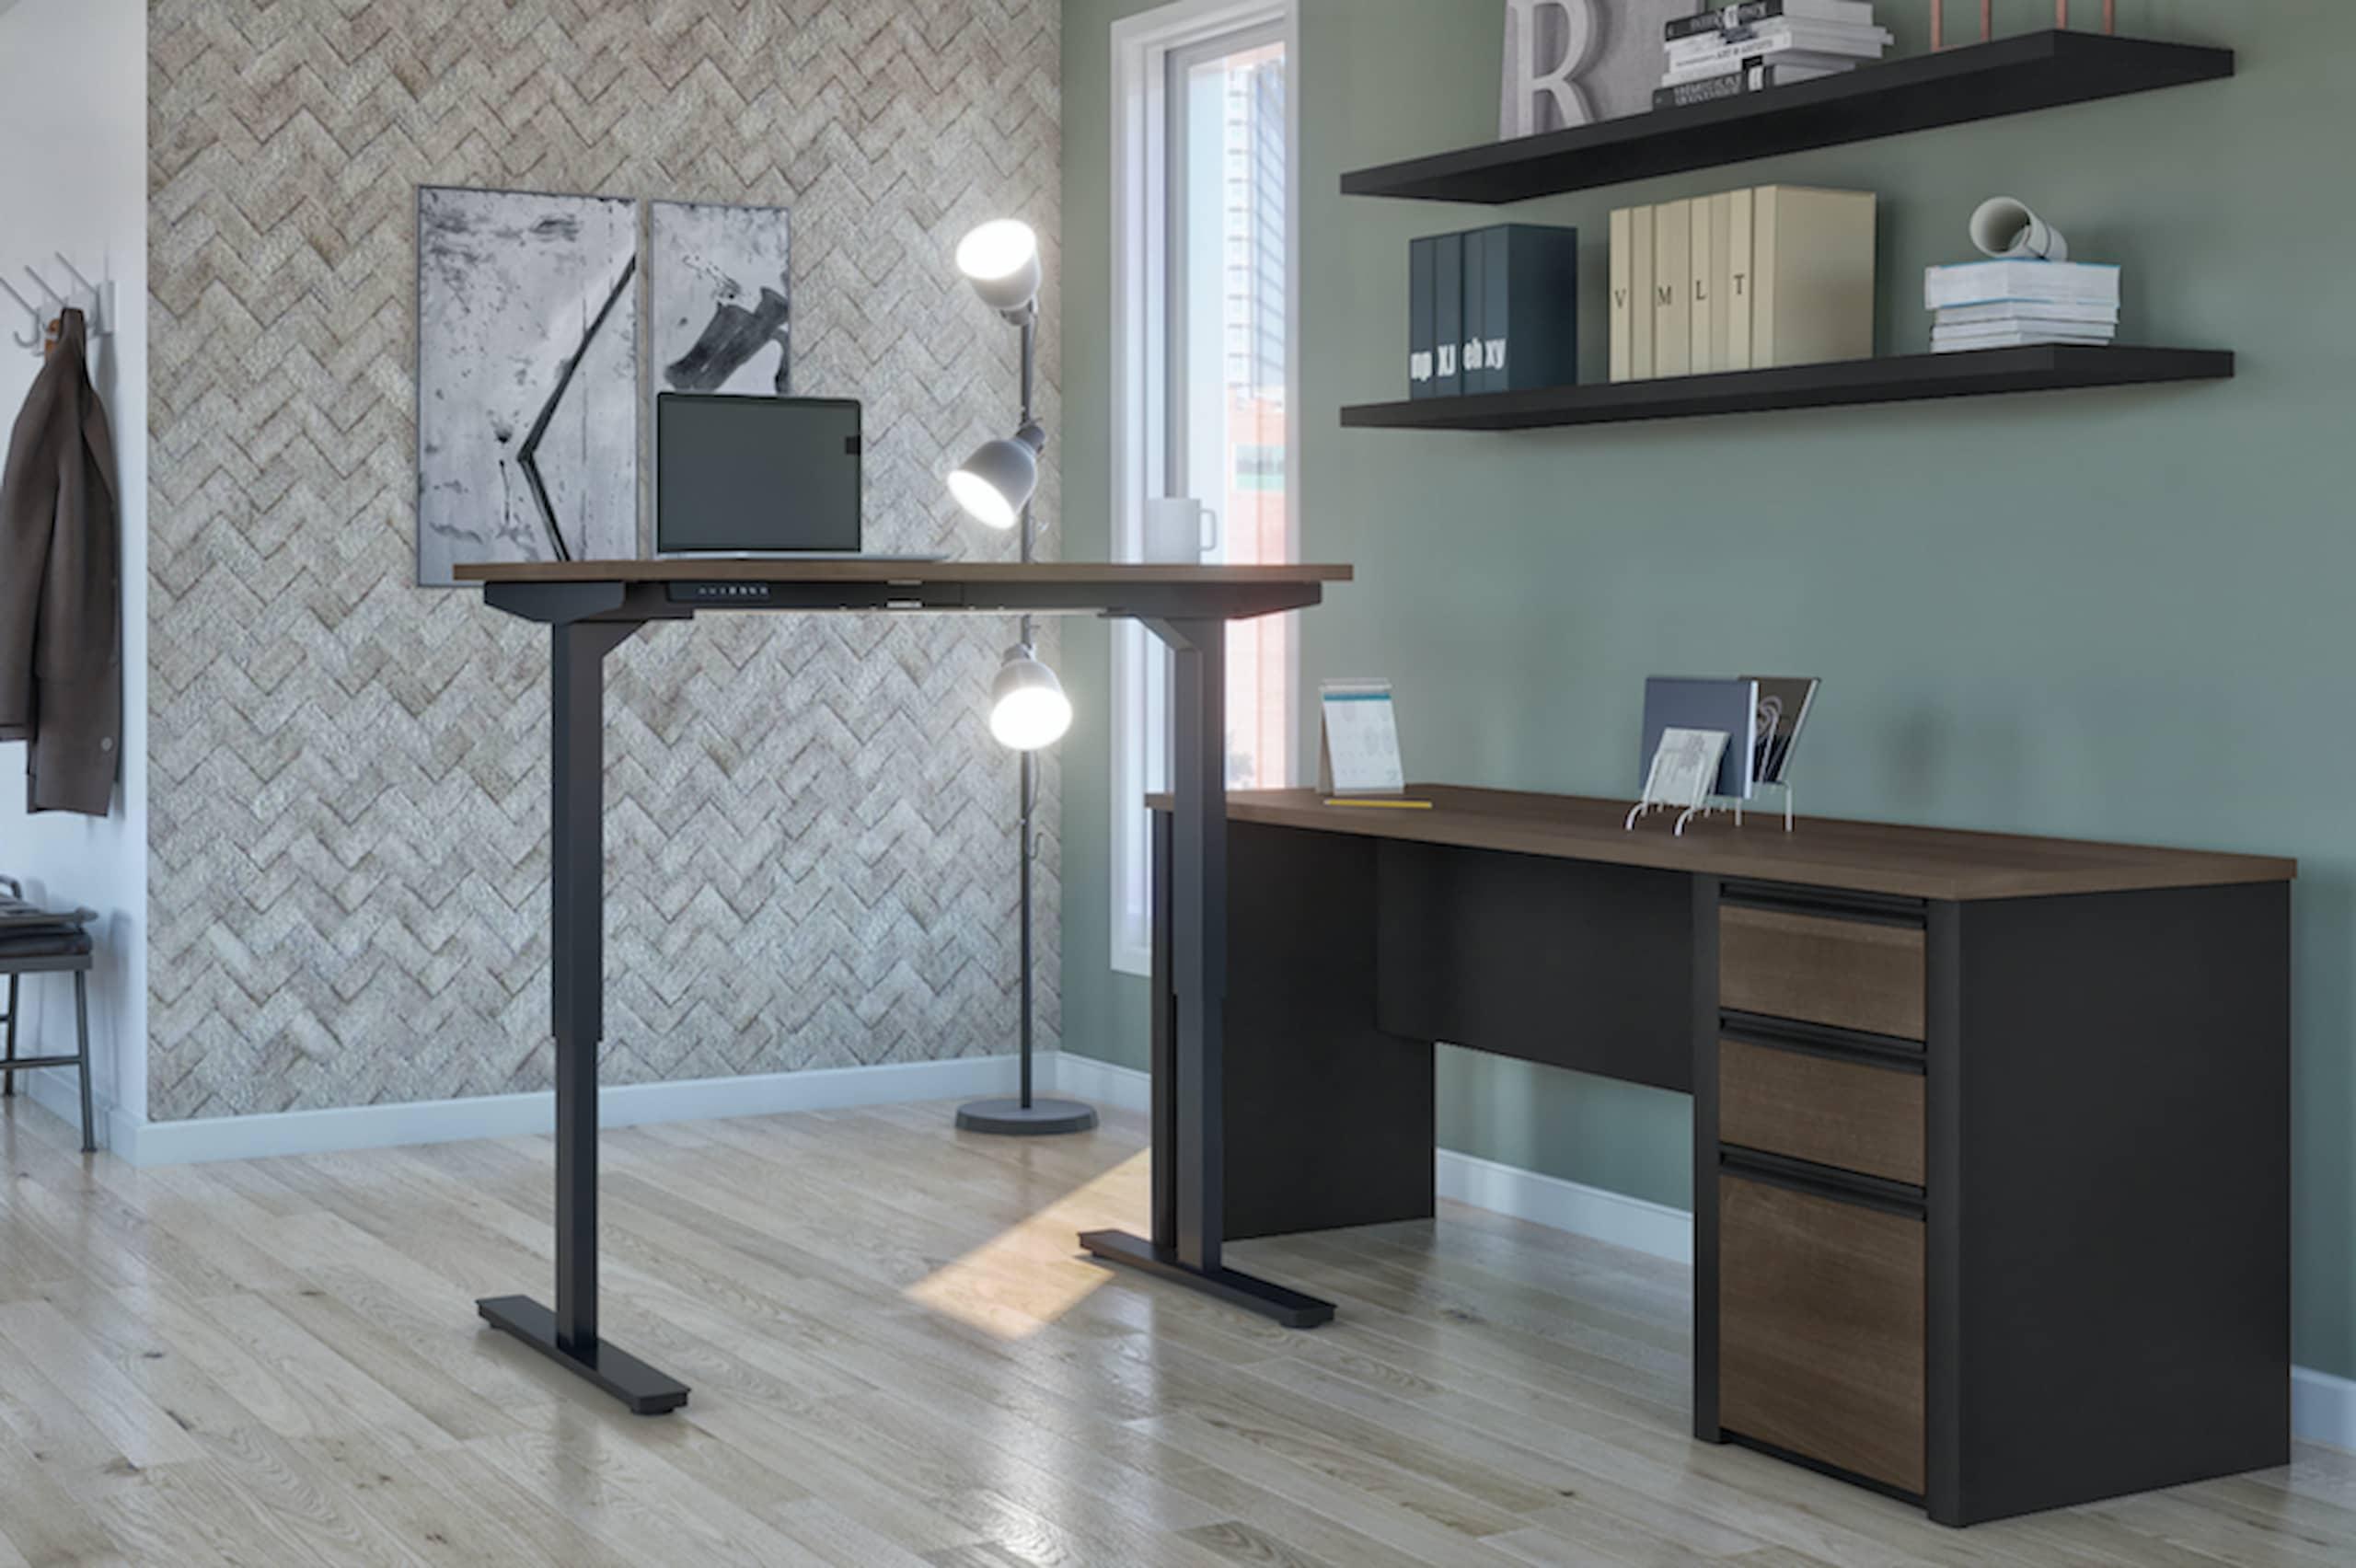 Hauteur de bureau standard et bureau assis-debout